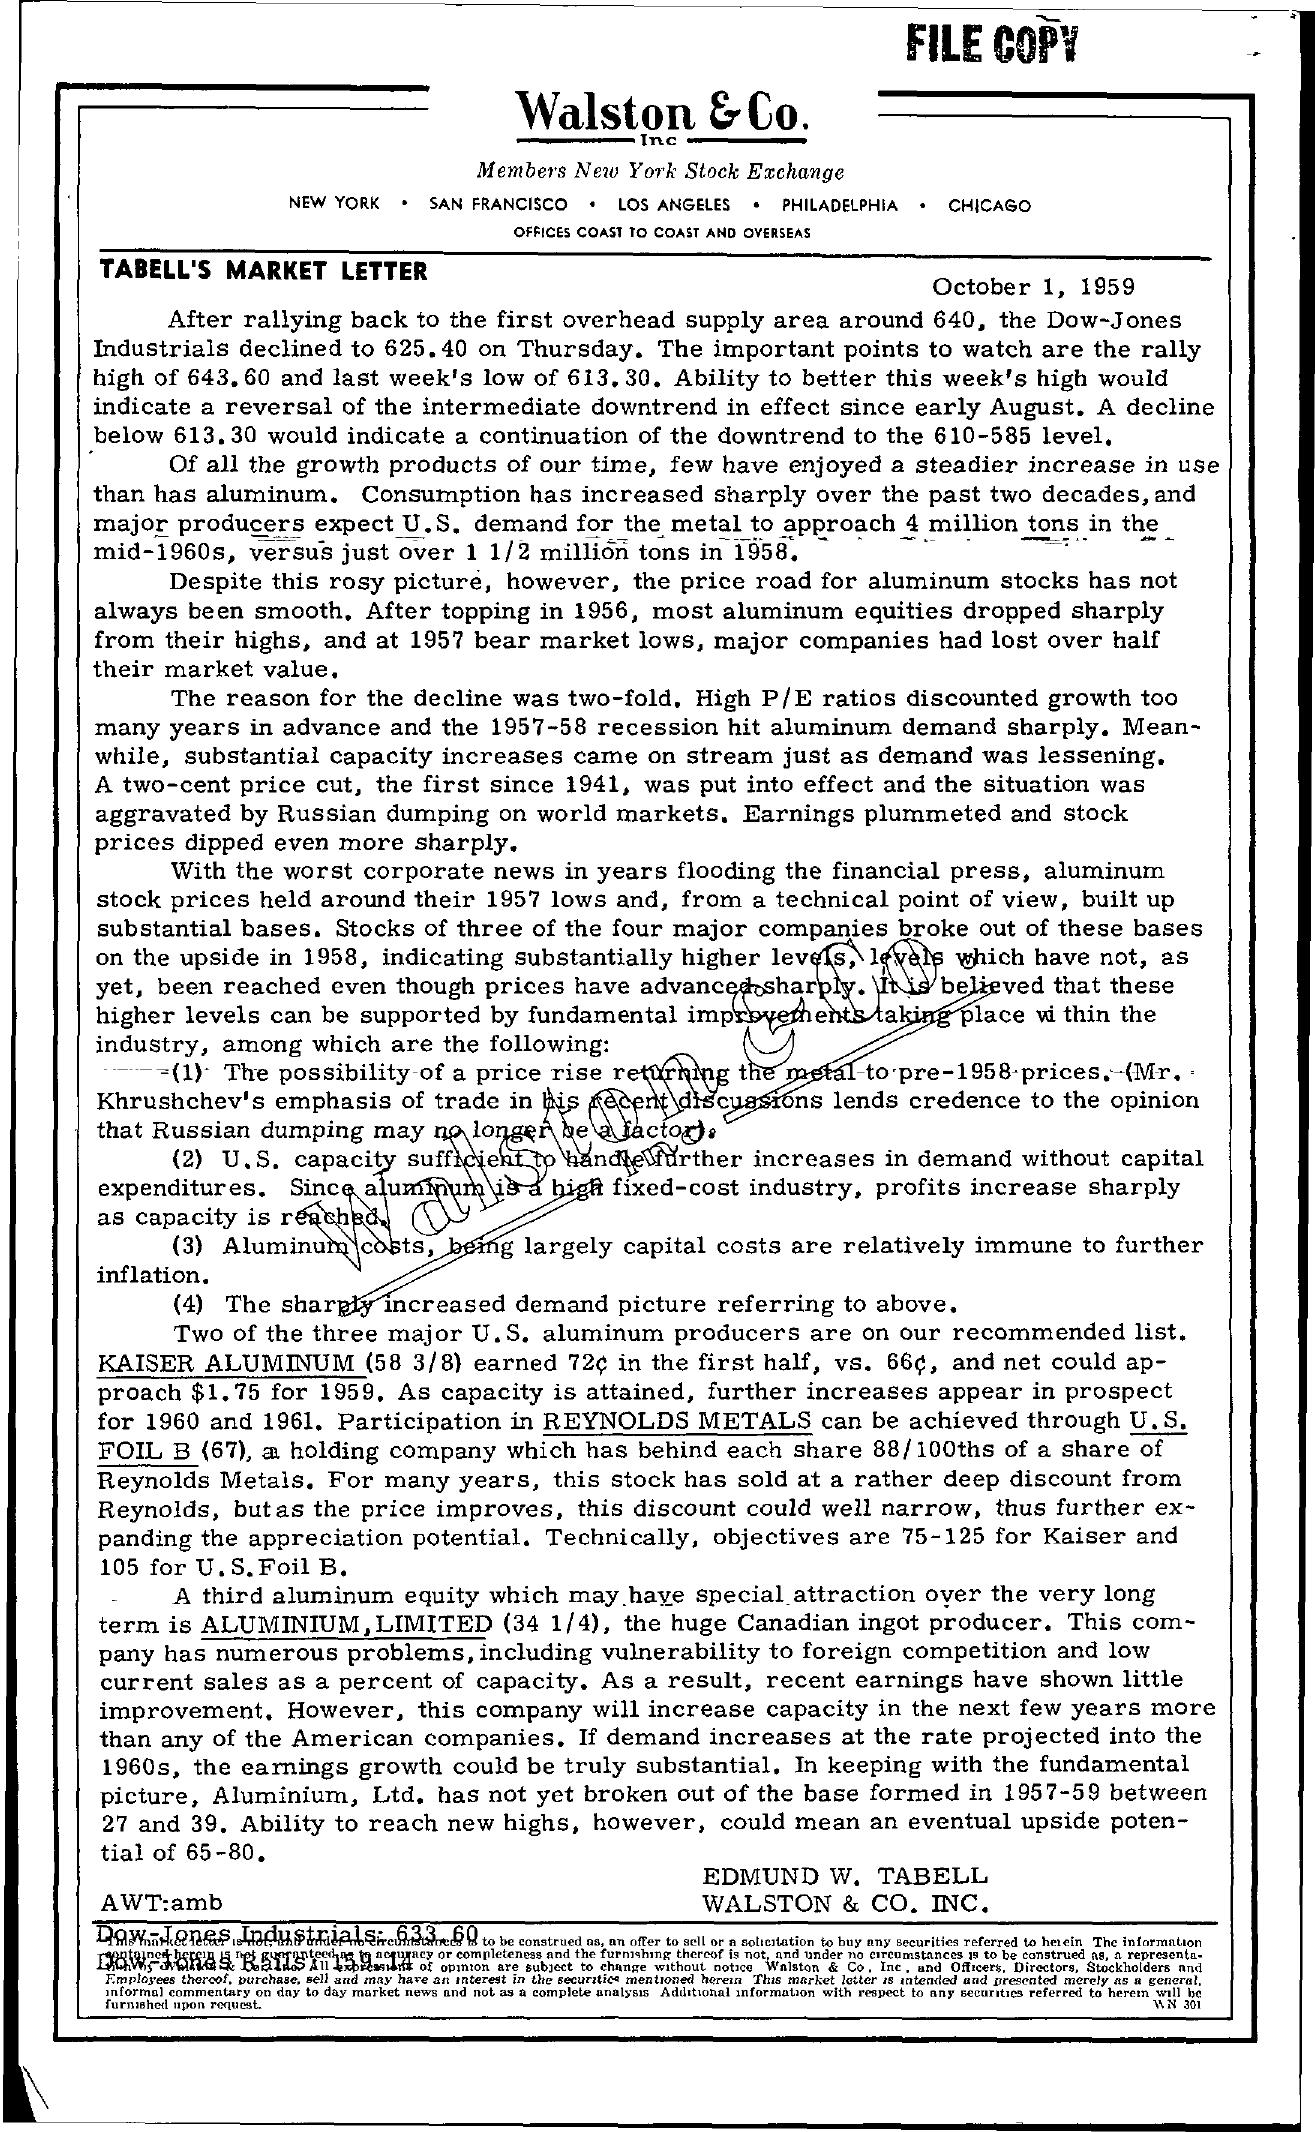 Tabell's Market Letter - October 01, 1959